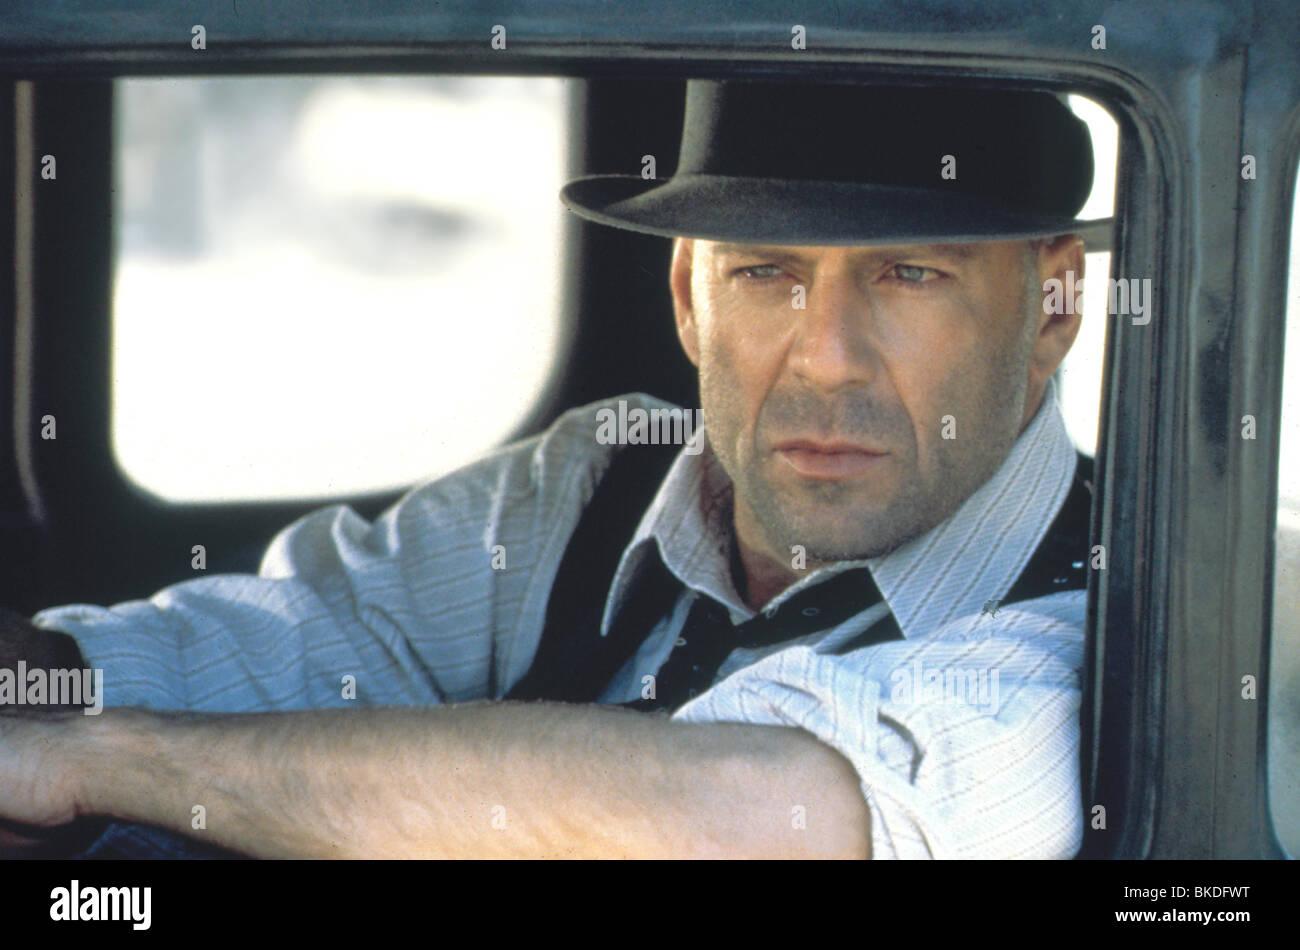 LAST MAN STANDING (1996) BRUCE WILLIS LAMA 002 - Stock Image